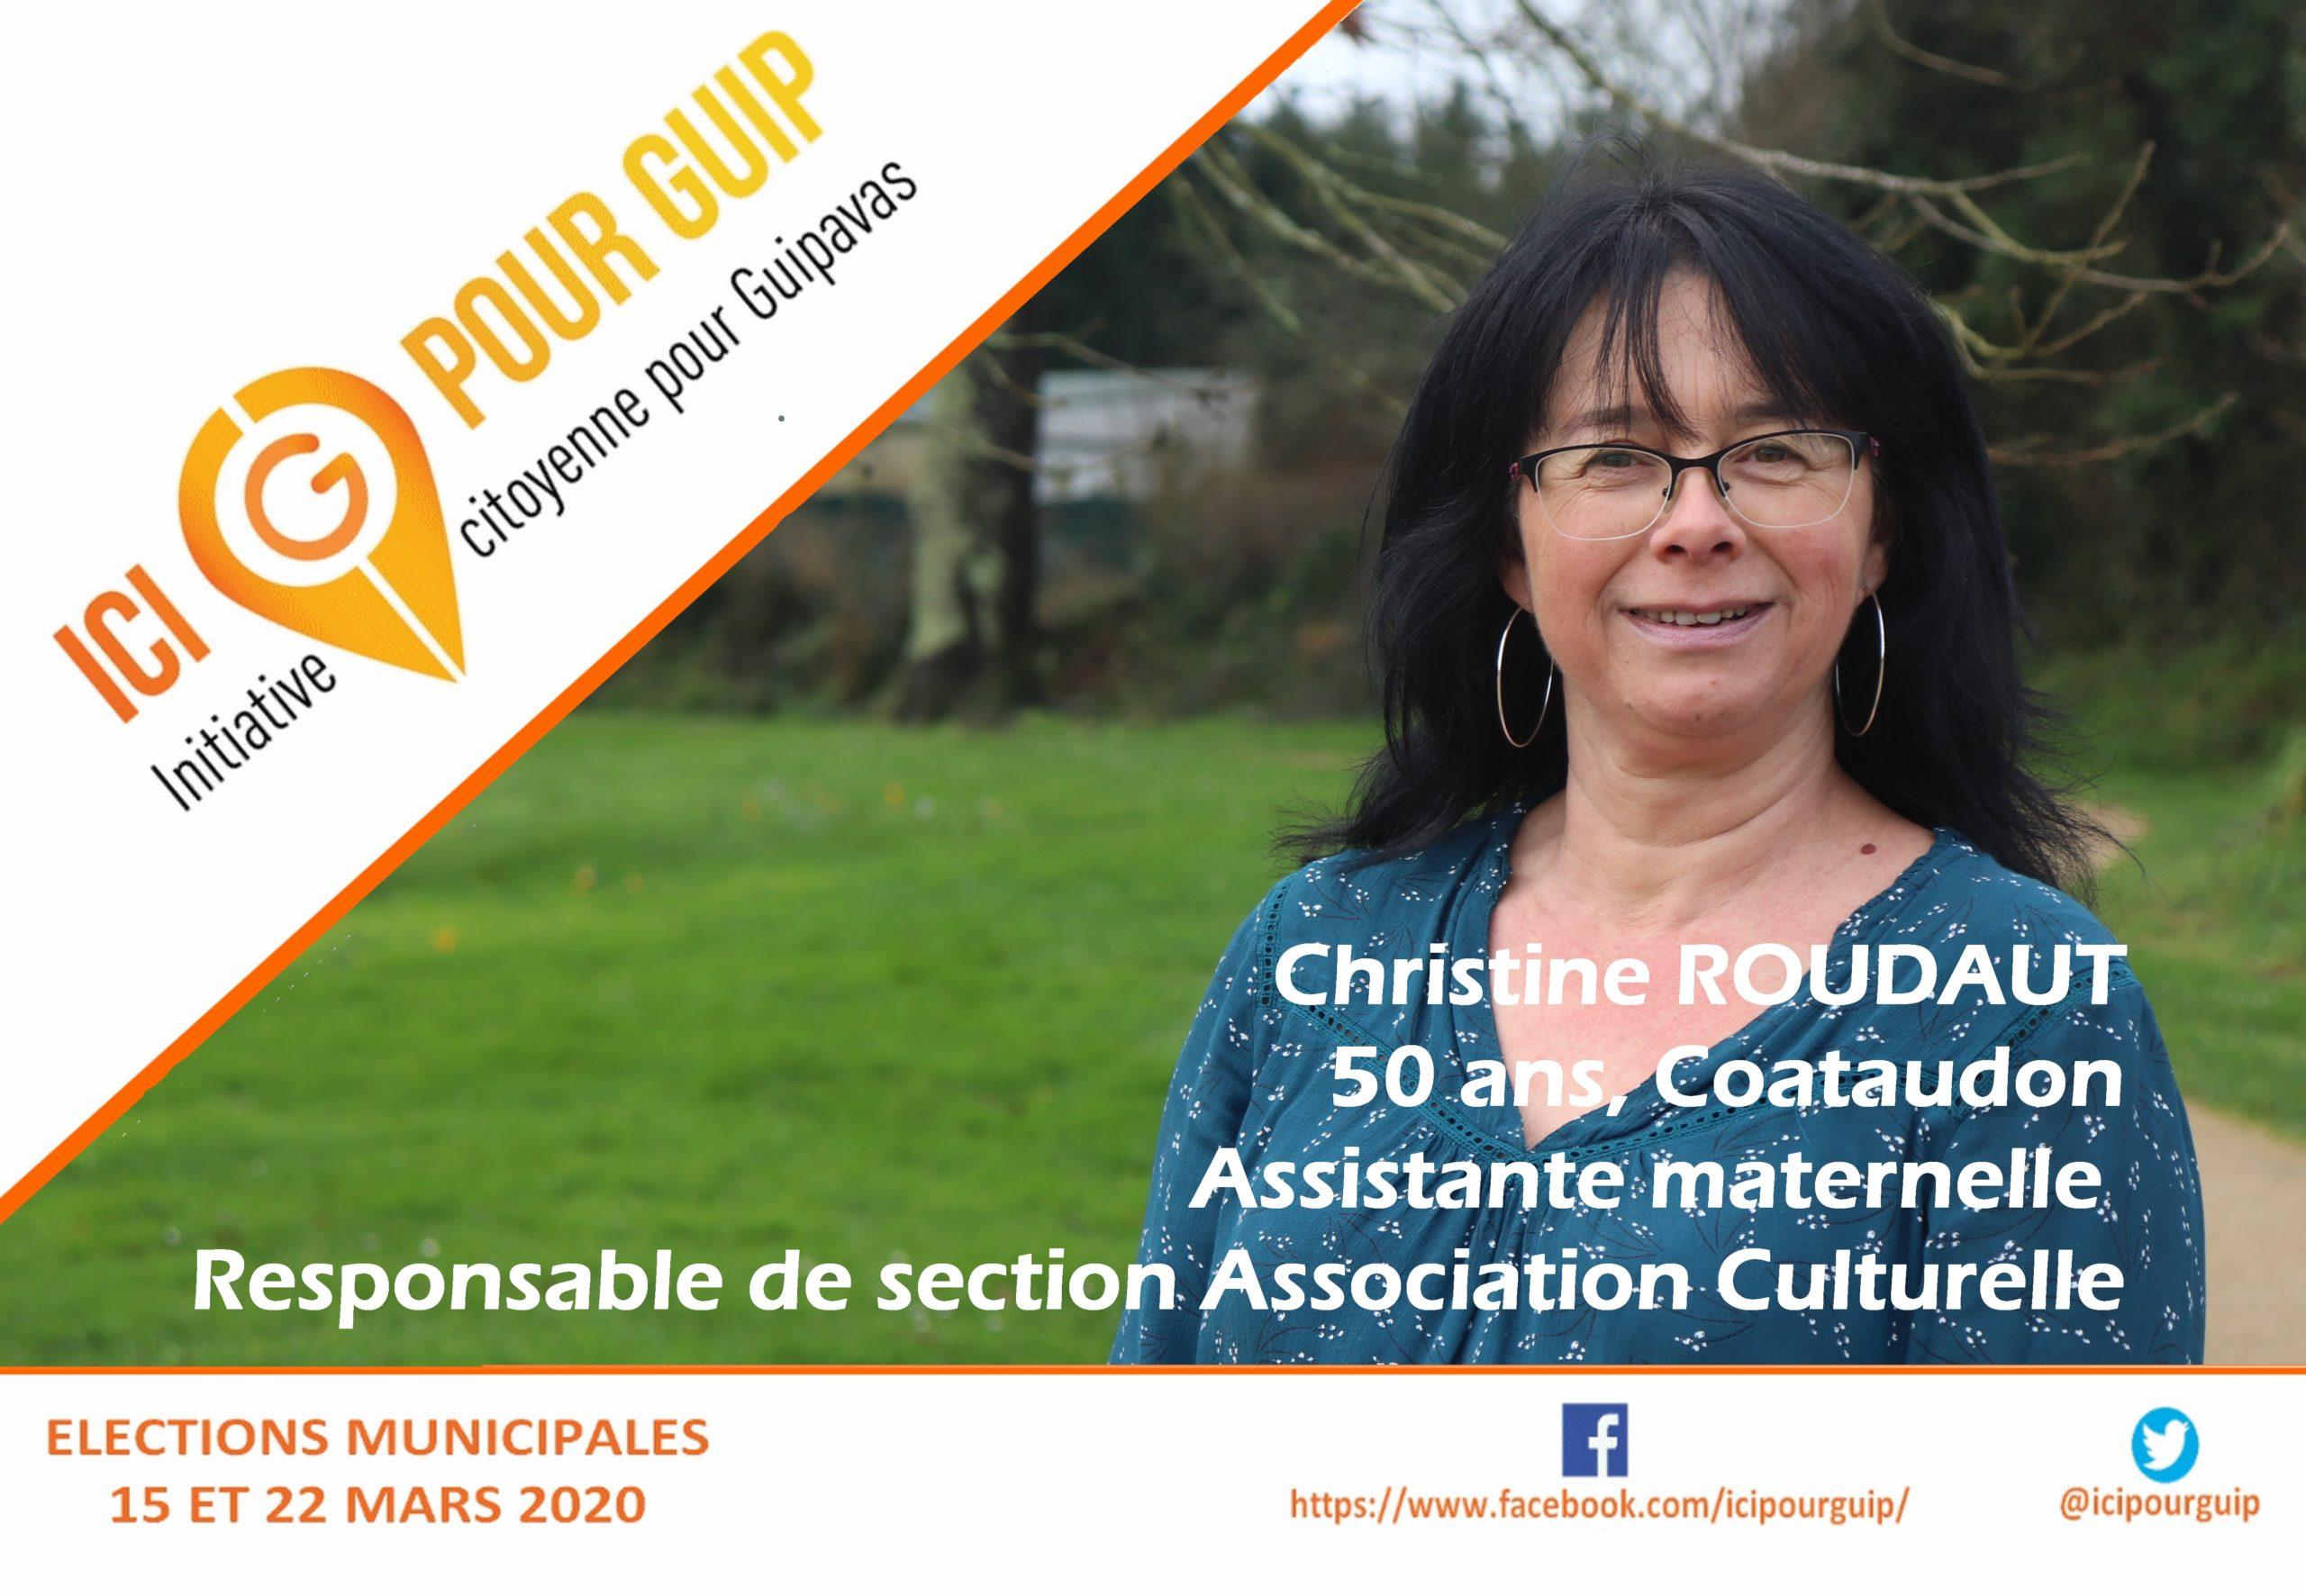 Christine Roudaut